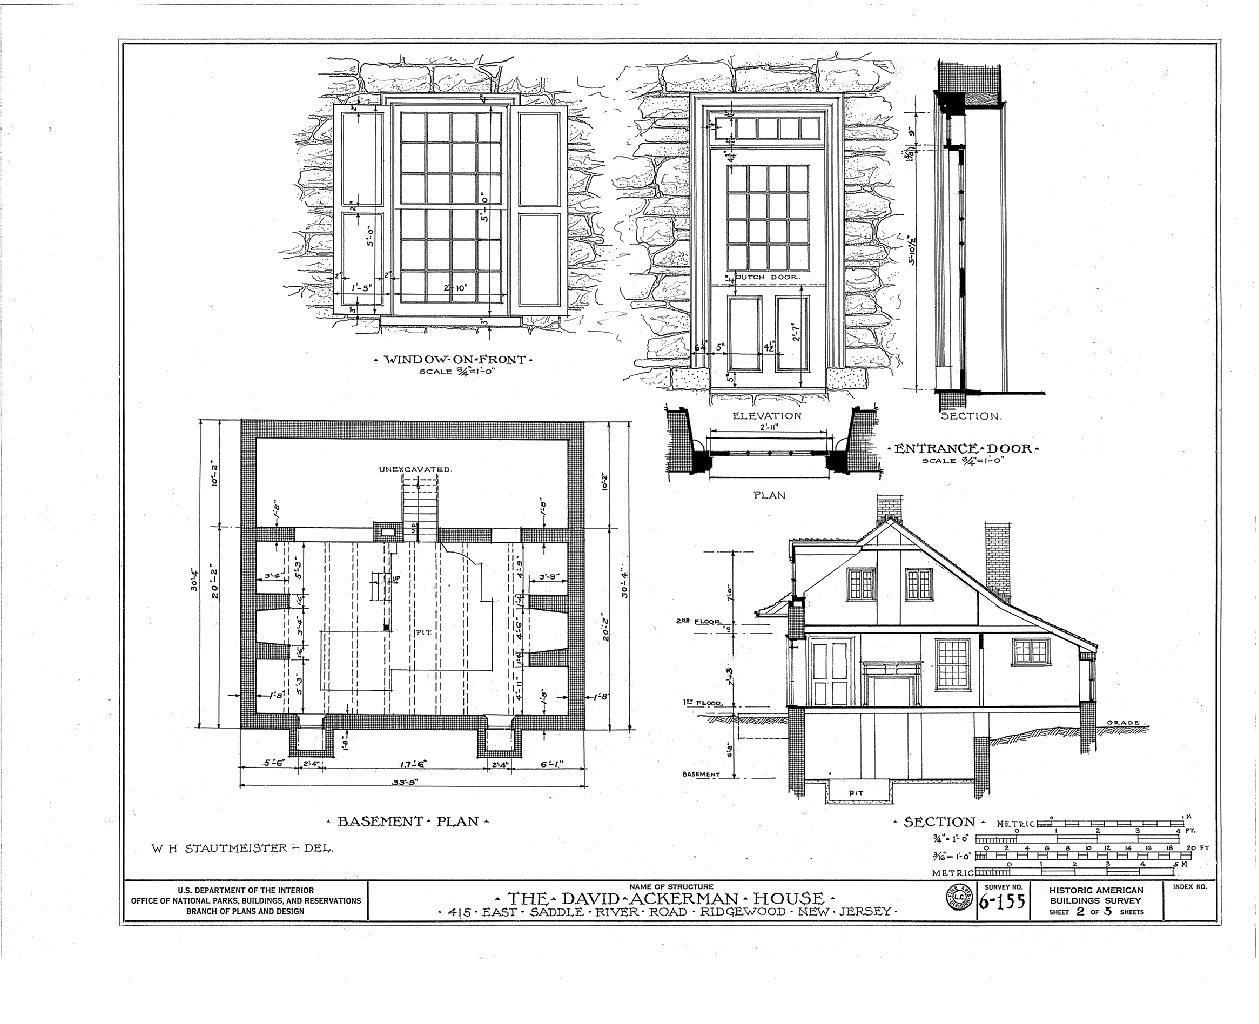 File David Ackerman Naugle House 415 East Saddle River Road Ridgewood Bergen County Nj Habs